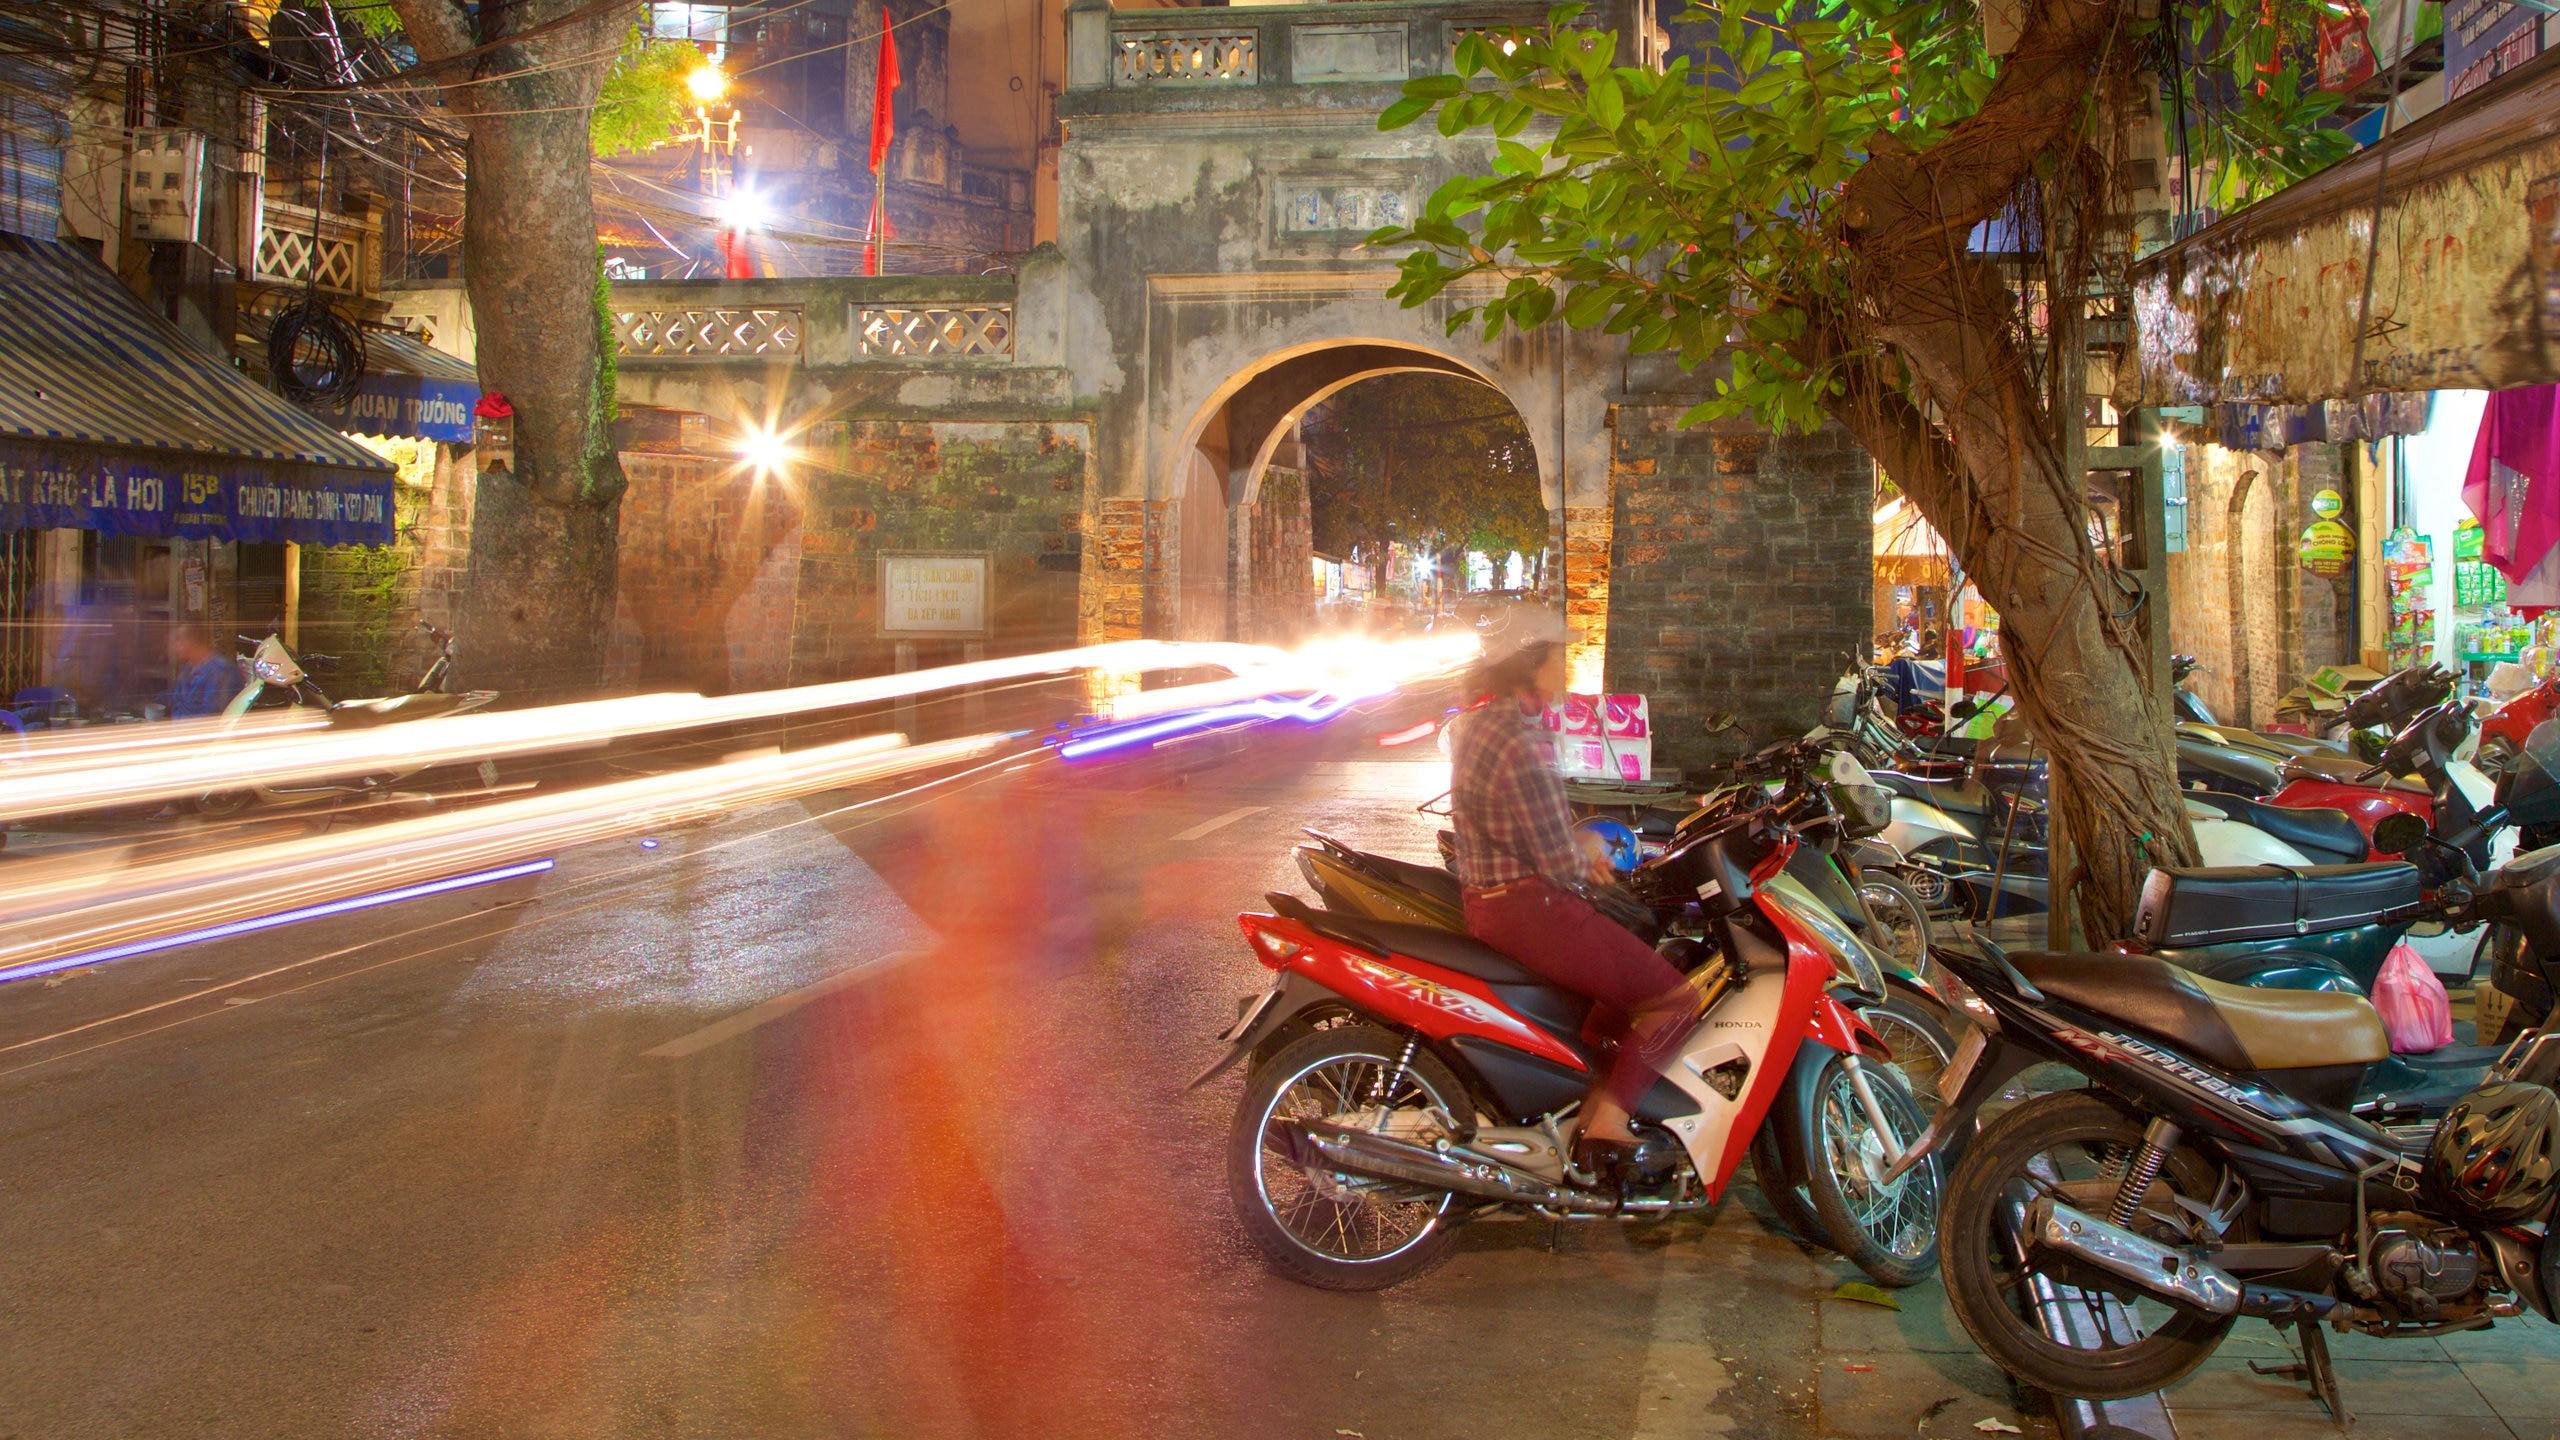 Hanoi Old City Gate, Hanoi, Vietnam